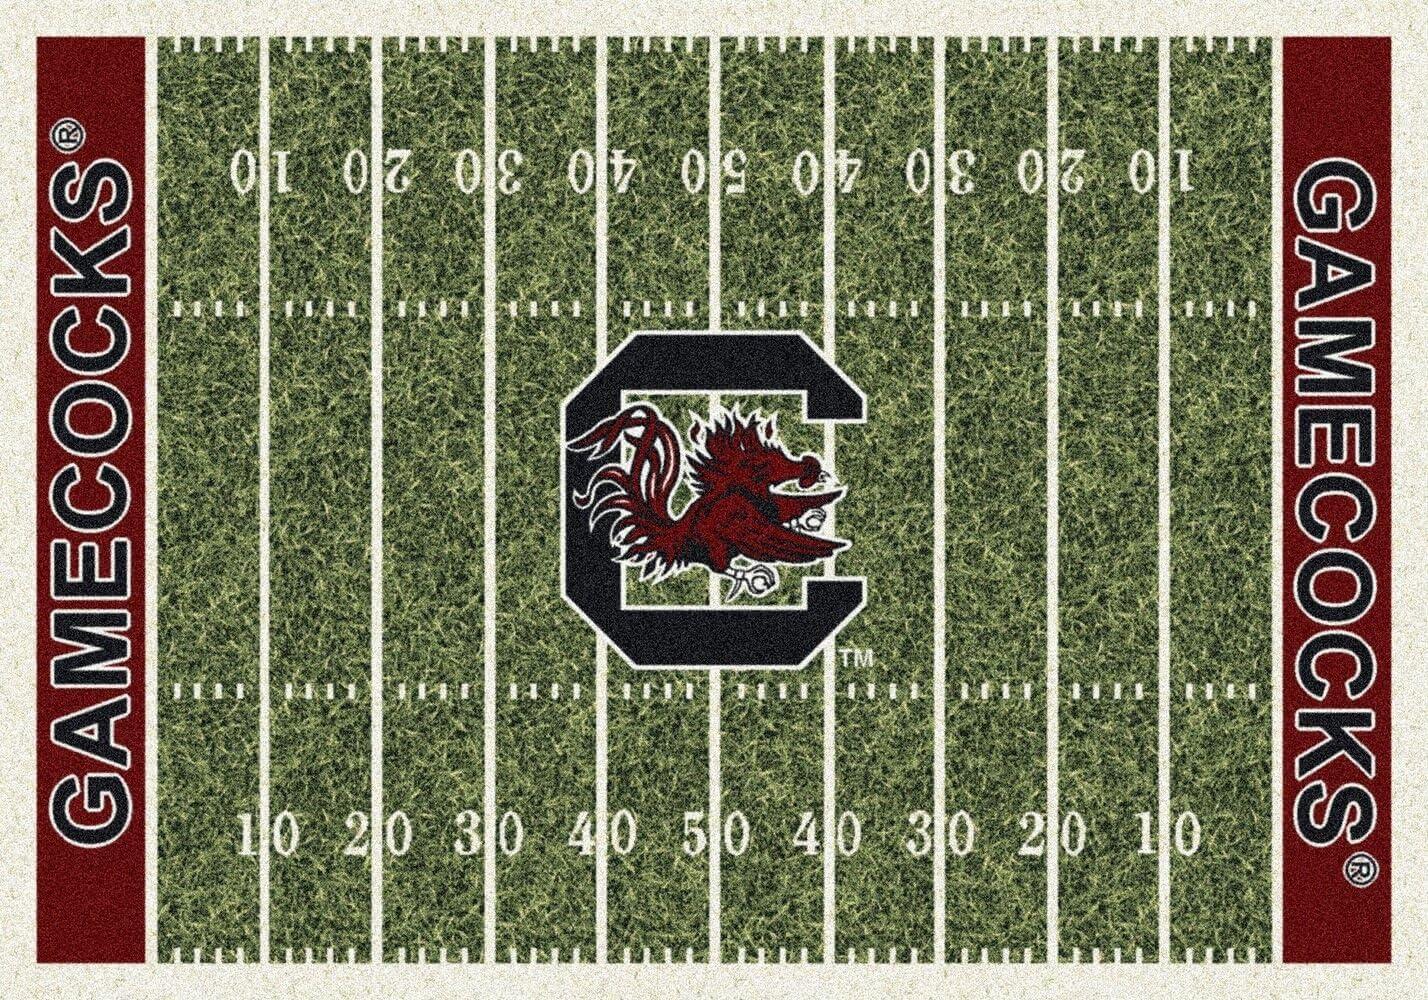 Koeckritz Rugs South Carolina Gamecocks NCAA Area Rug 5 4 x 7 8 , Home Field